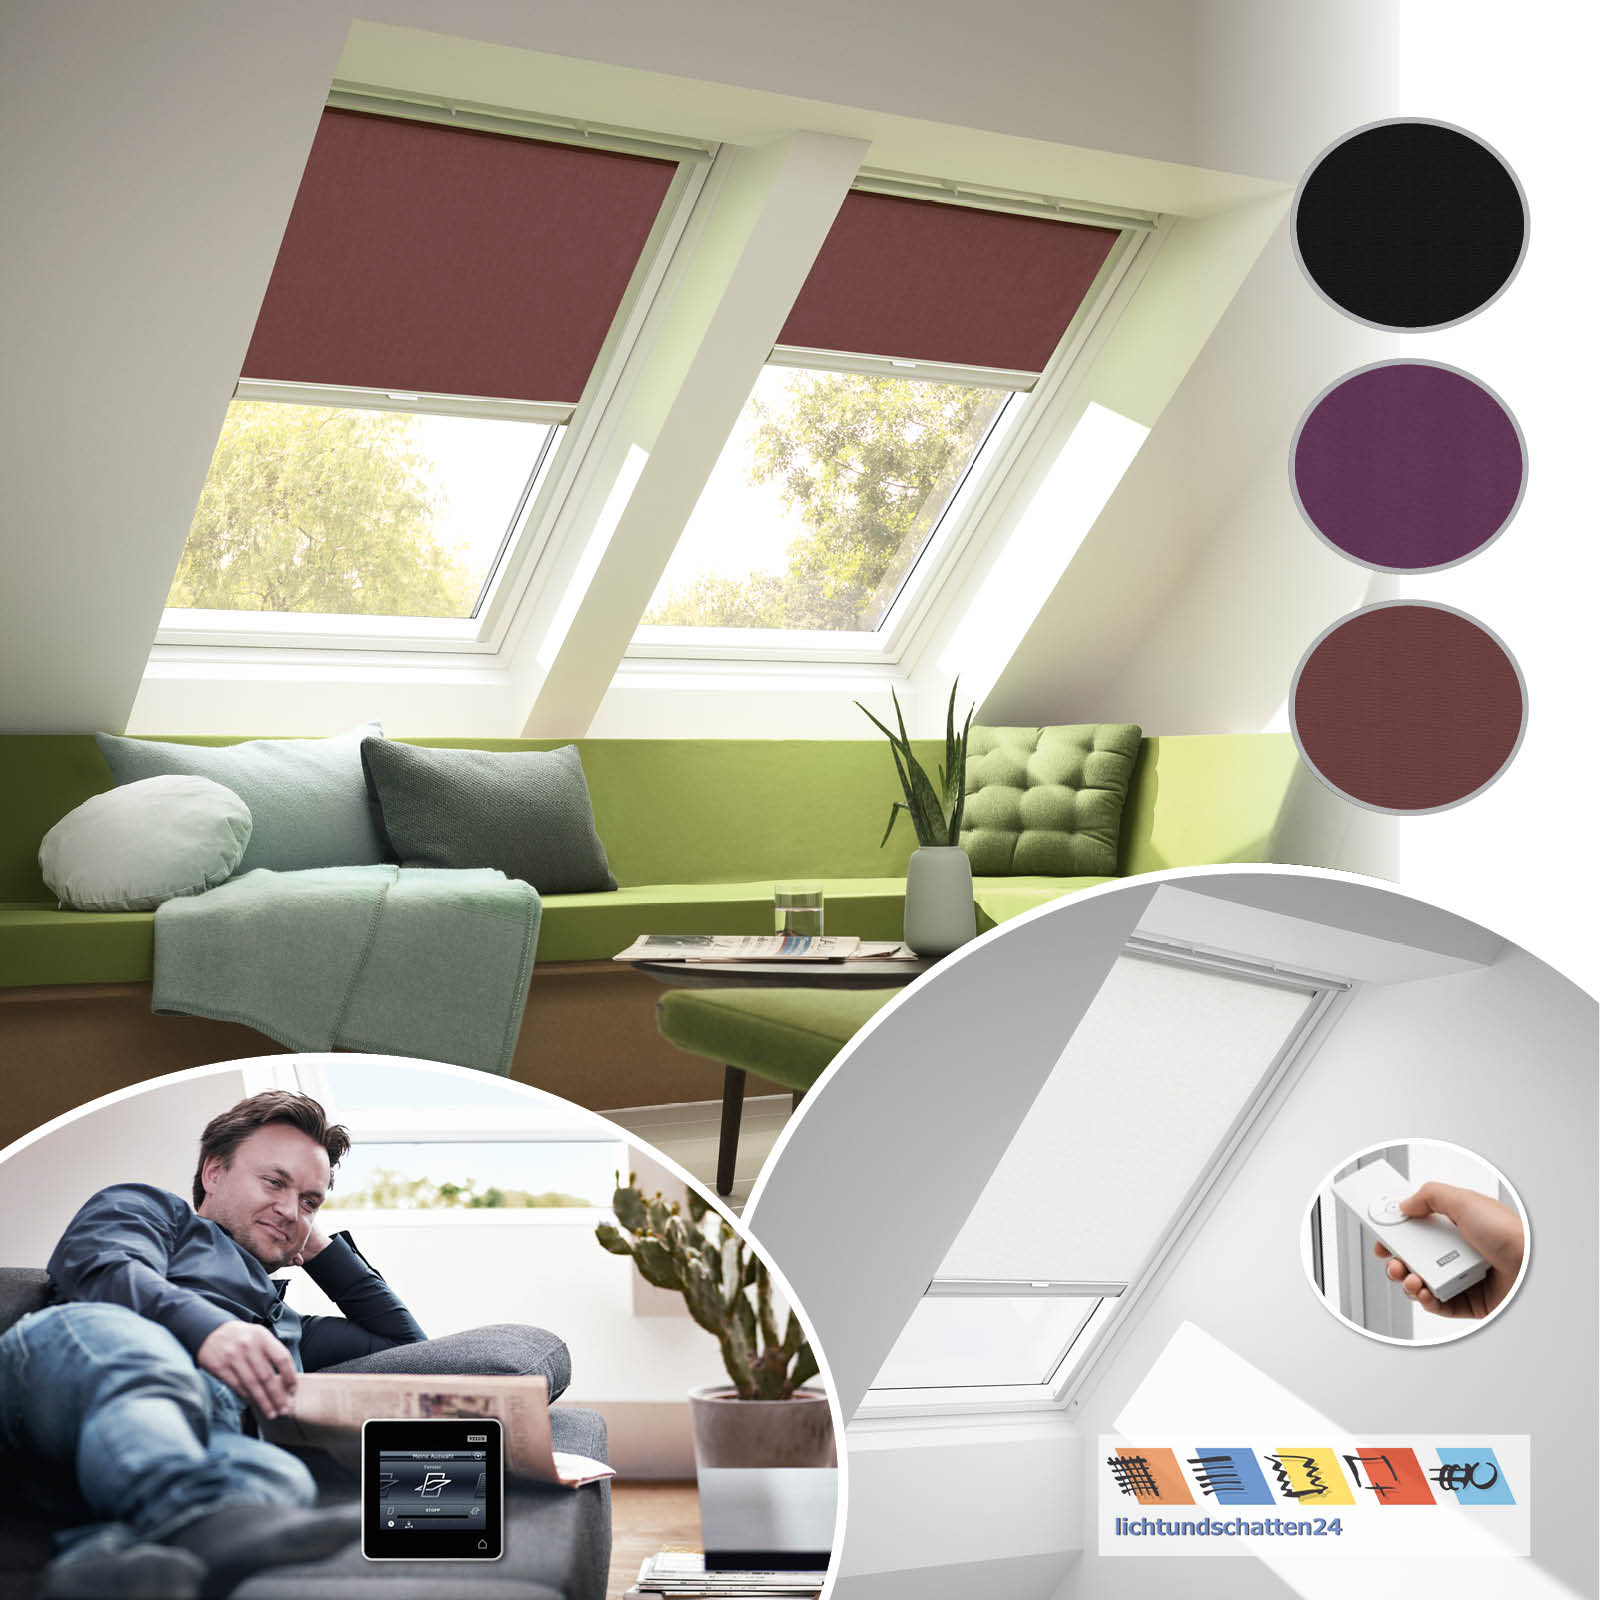 orig velux solar dachfenster rollo 4060 4157 4069 ggu gpu ghu gtu ggl gpl ghl ebay. Black Bedroom Furniture Sets. Home Design Ideas